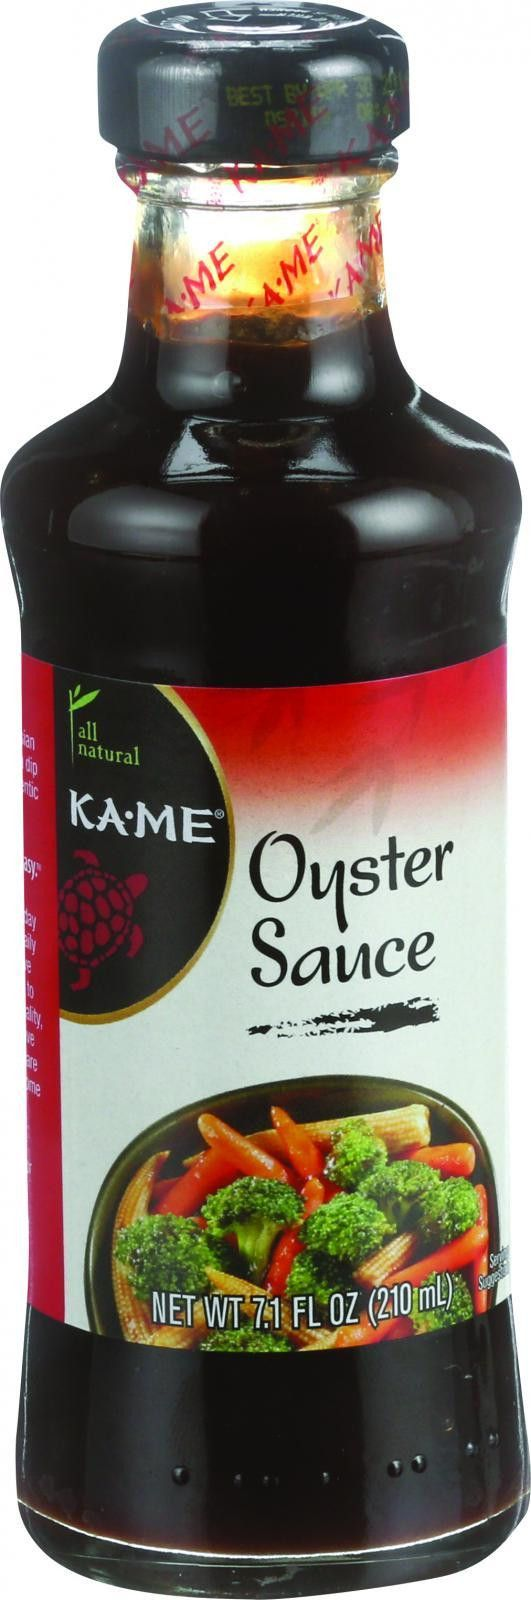 Ka'me Oyster Sauce - 7.1 Oz - Case Of 6